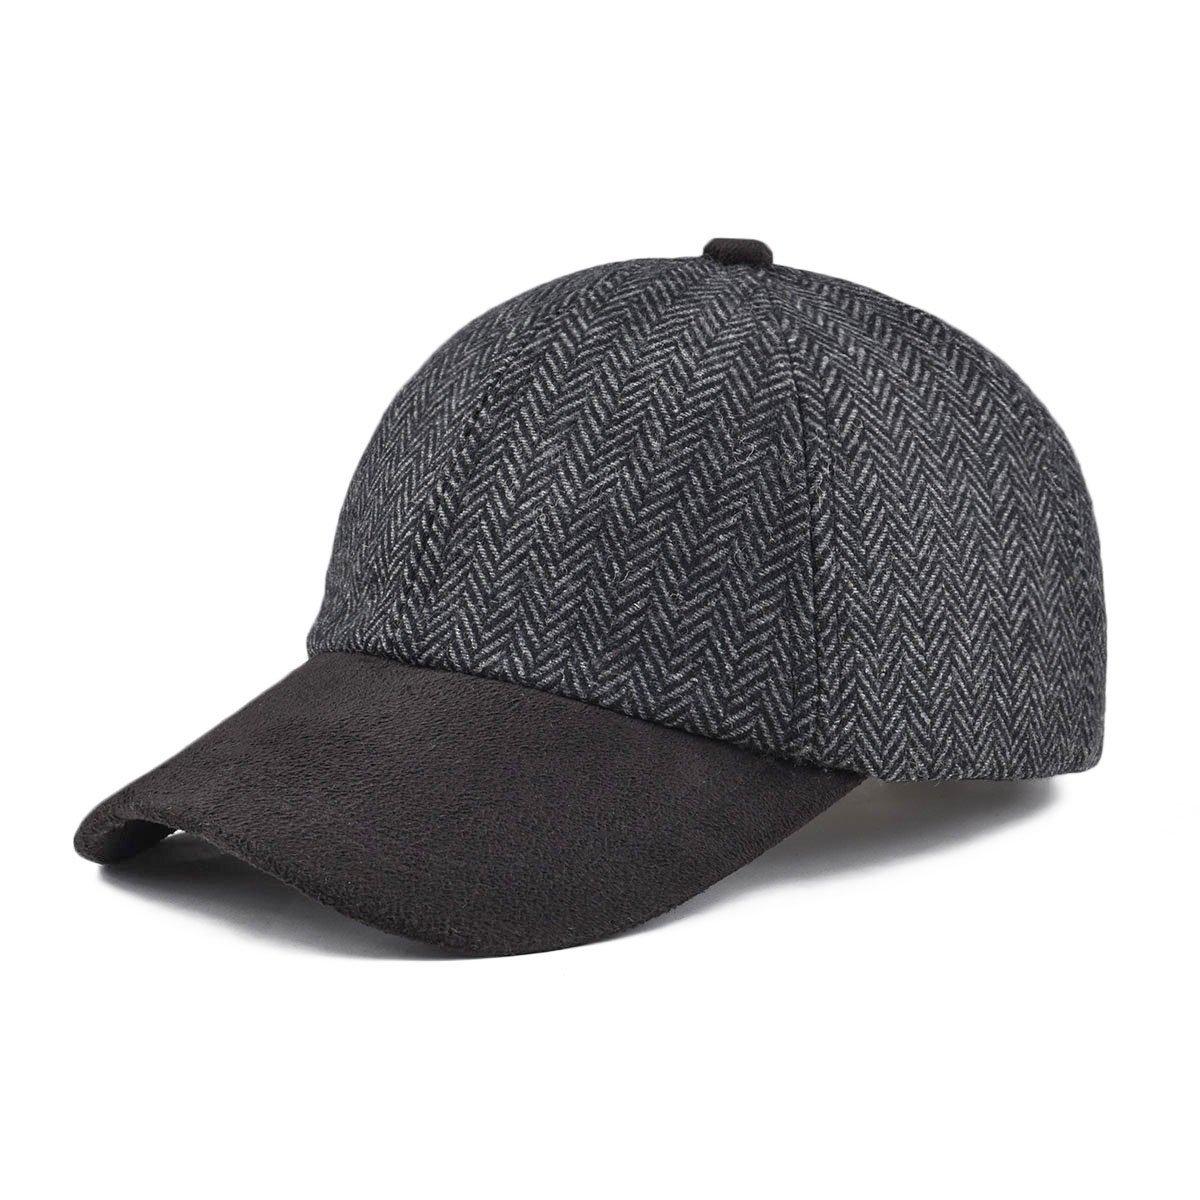 41dd87b9 Product description. VOBOOM Men's Wool Blend Baseball Cap Herringbone Tweed  Ball Cap Check Woolen Adjustable Peaked Cap